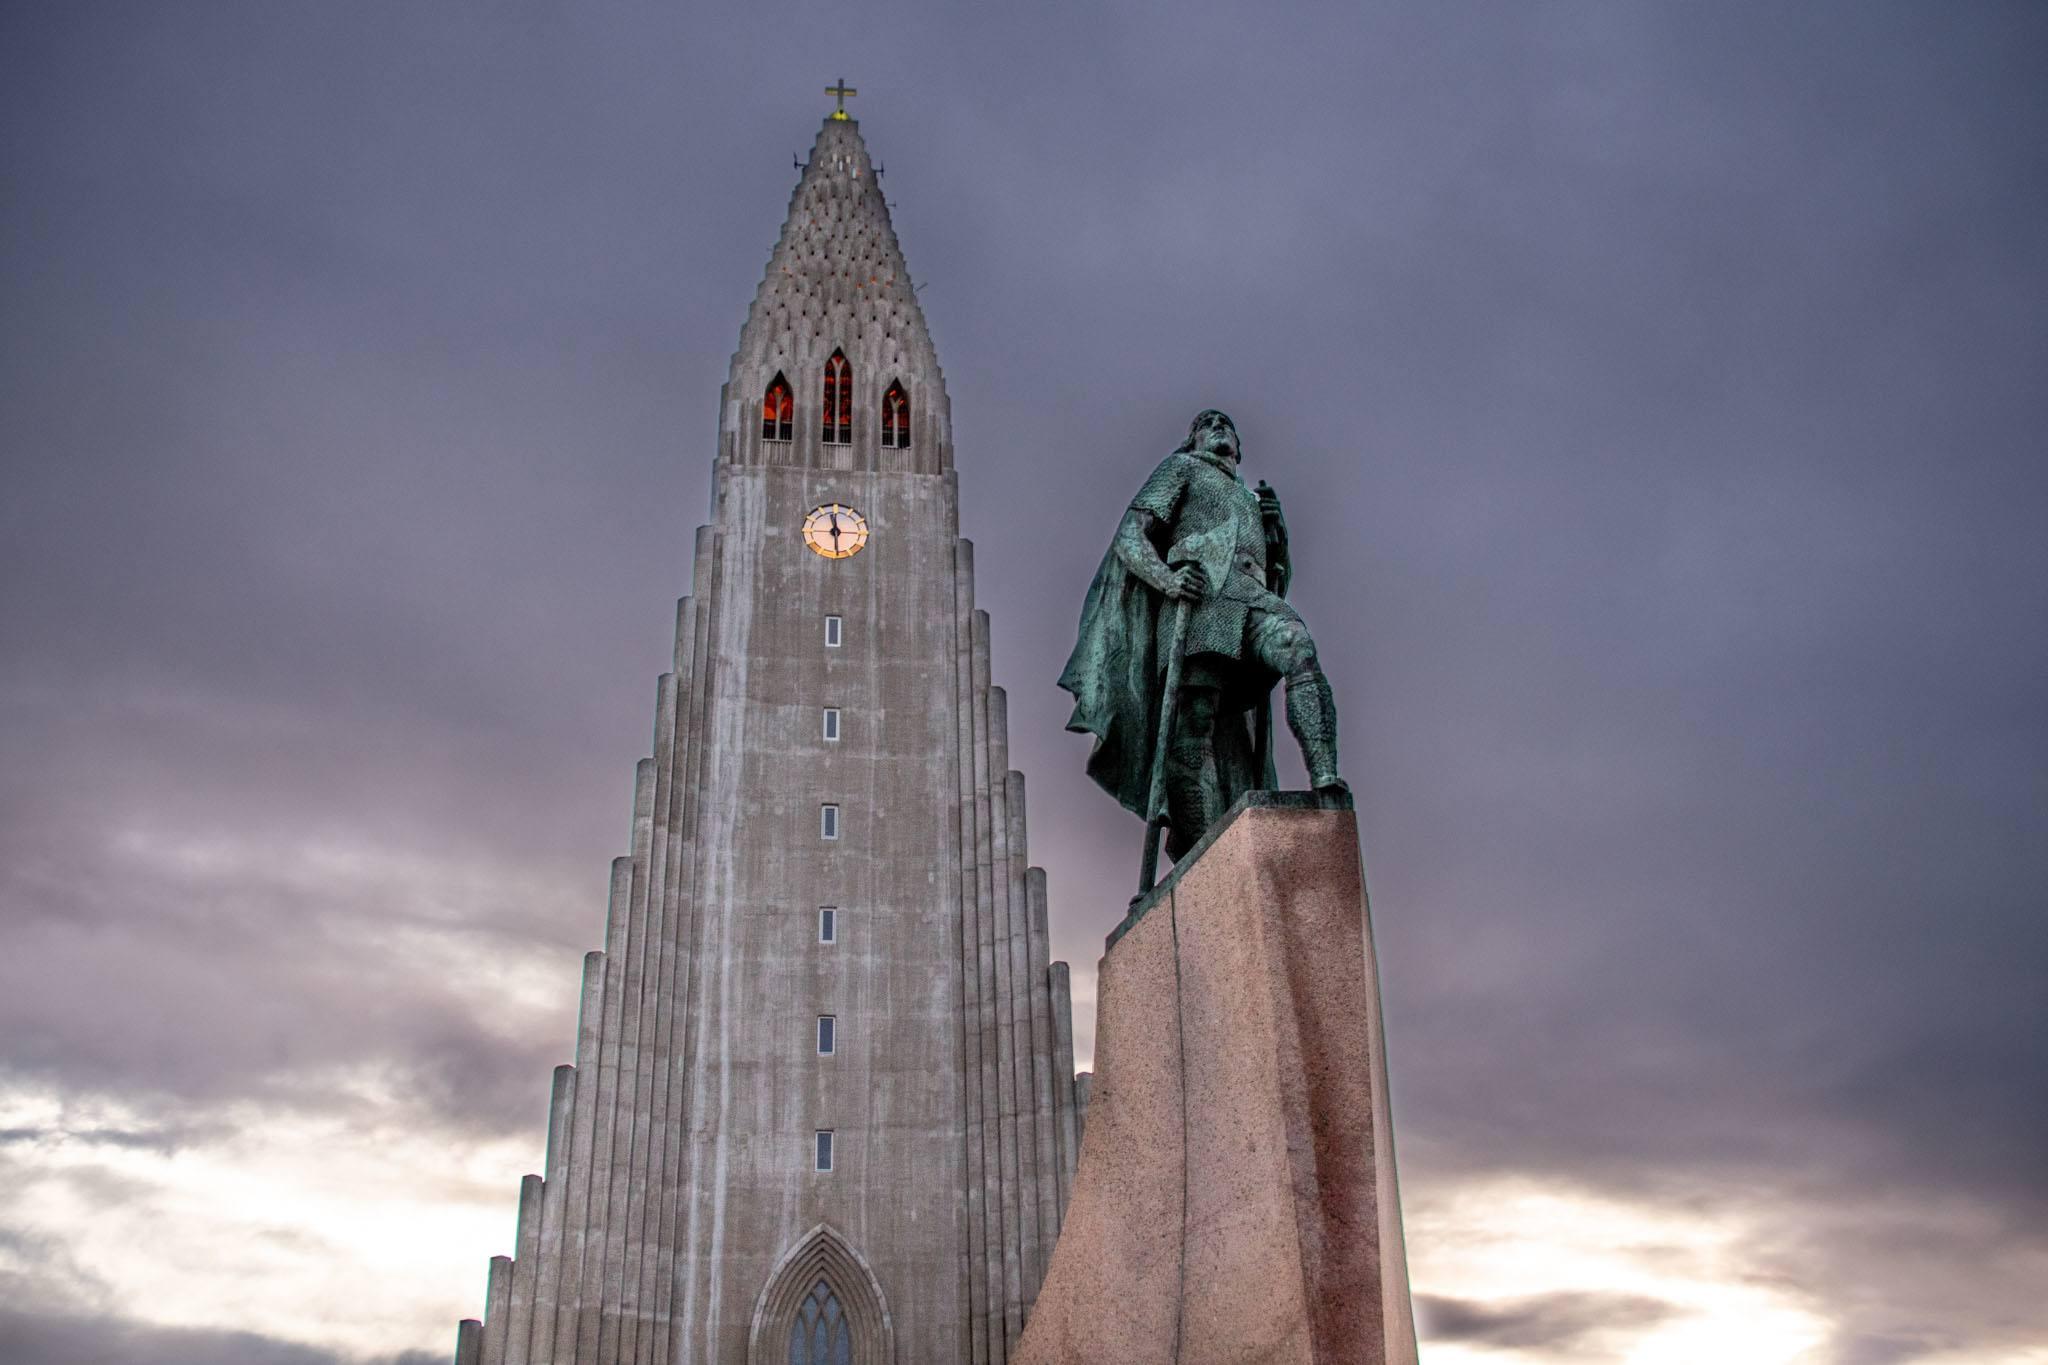 Leif Ericsson statue in front of the Hallgrimskirkja church in Reykjavik